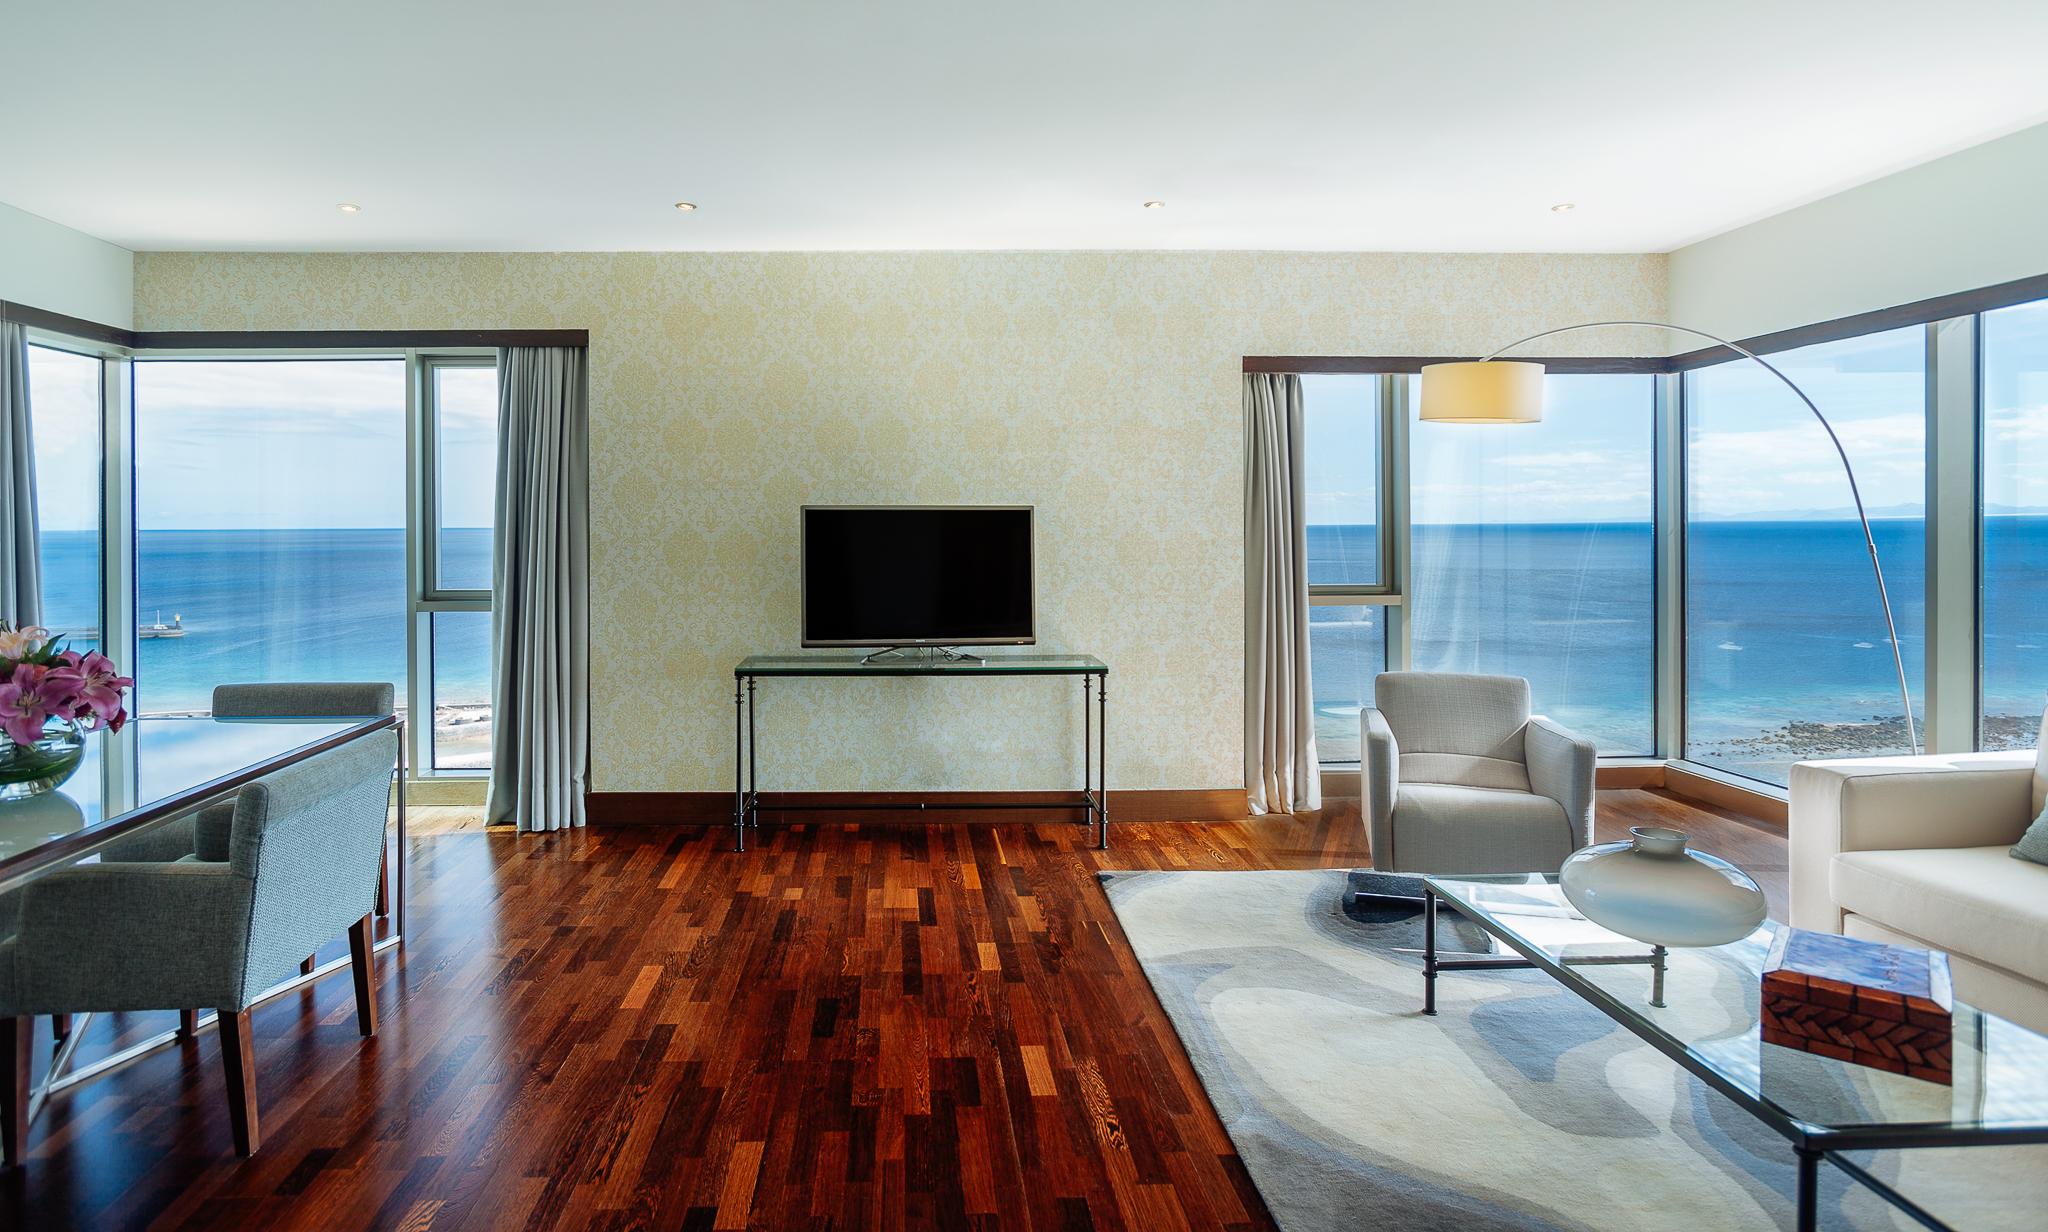 5* Hotel Room